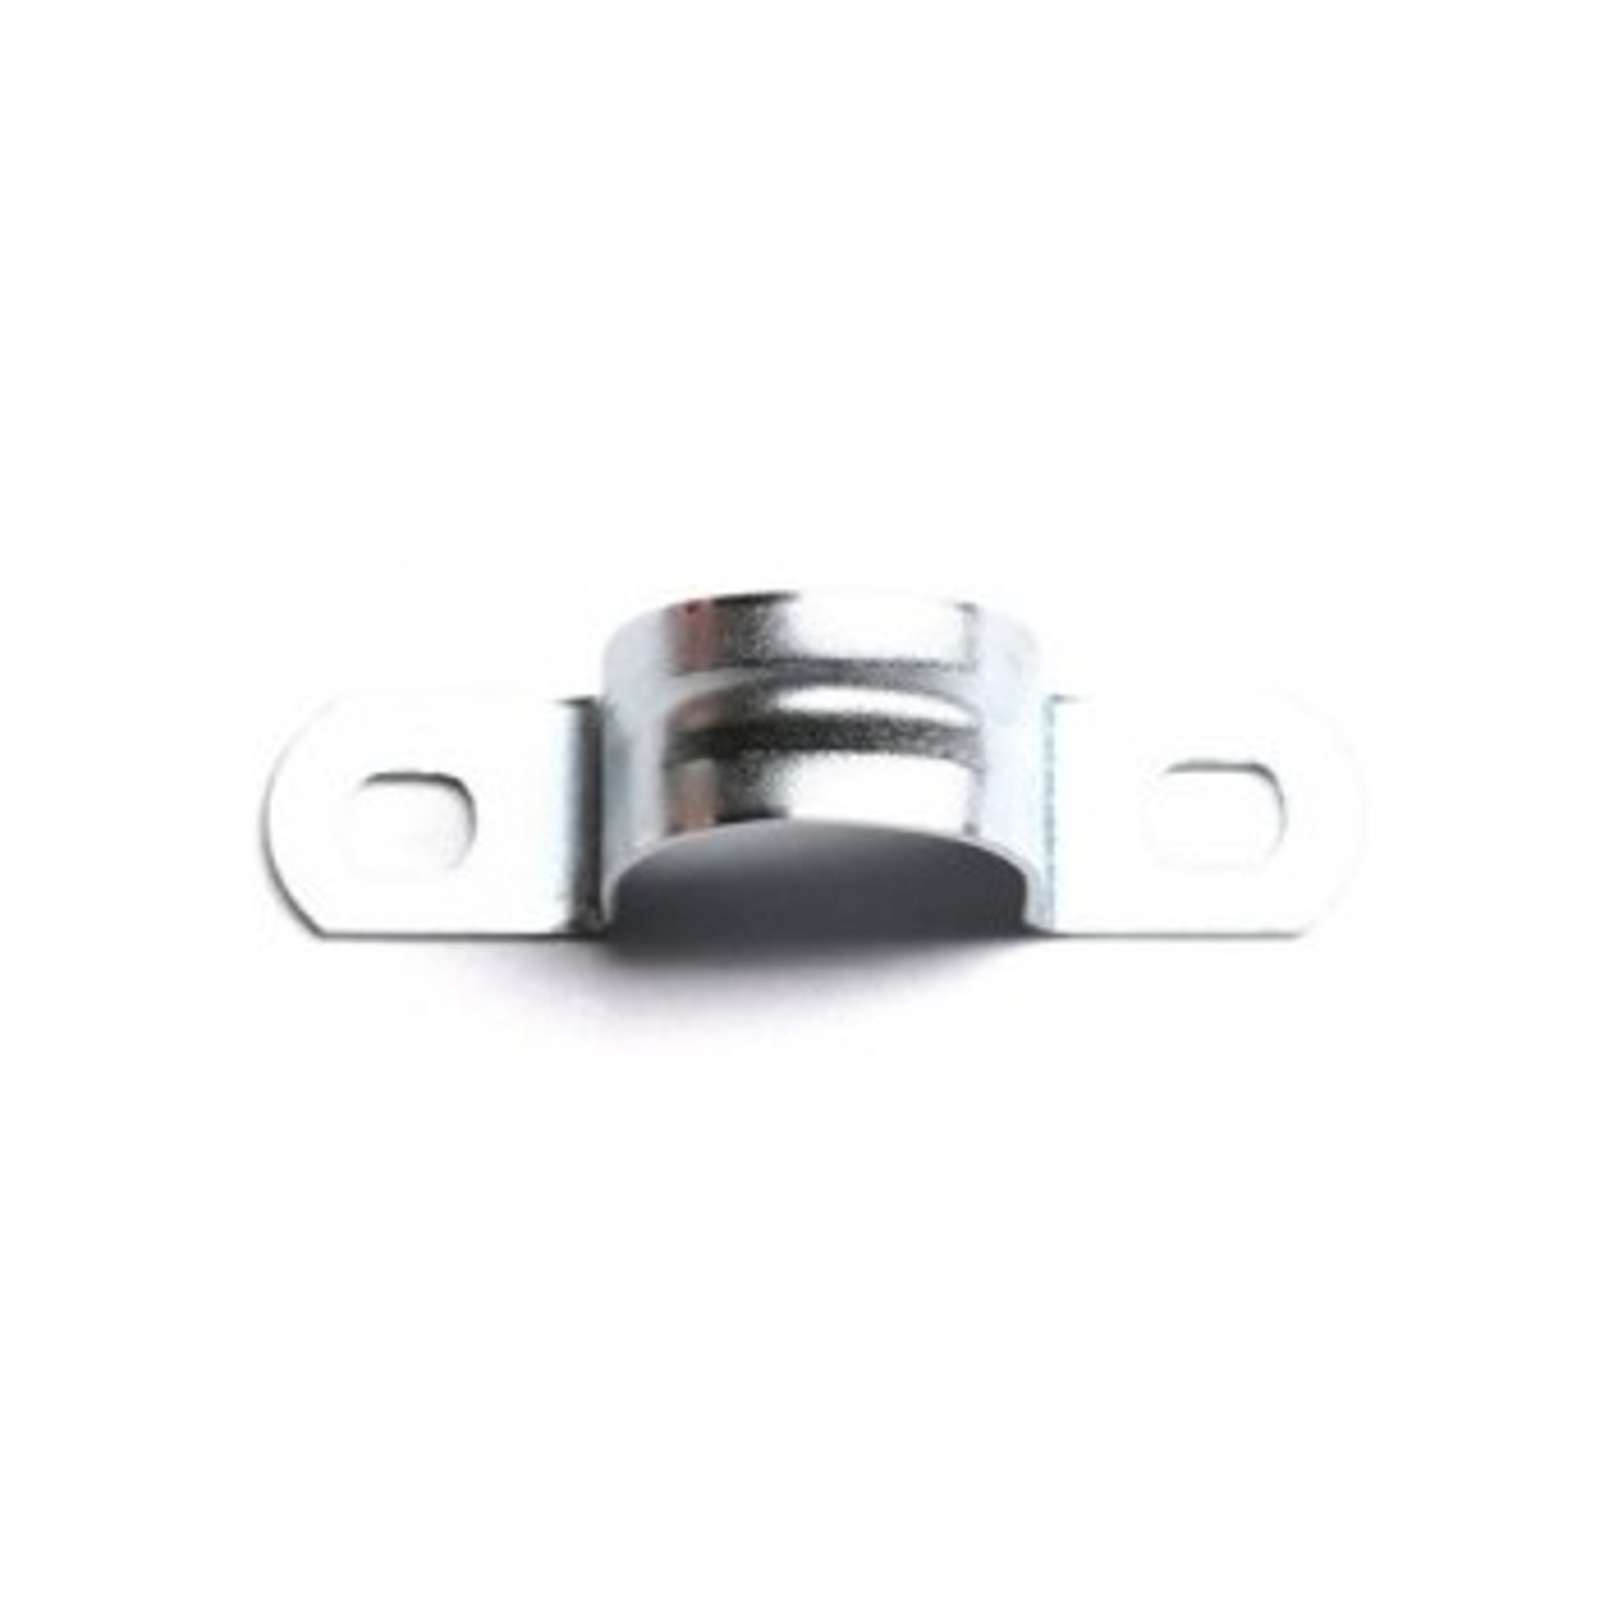 Скоба креп. метал. оцинк. двухлап. d50мм ДКС 53361